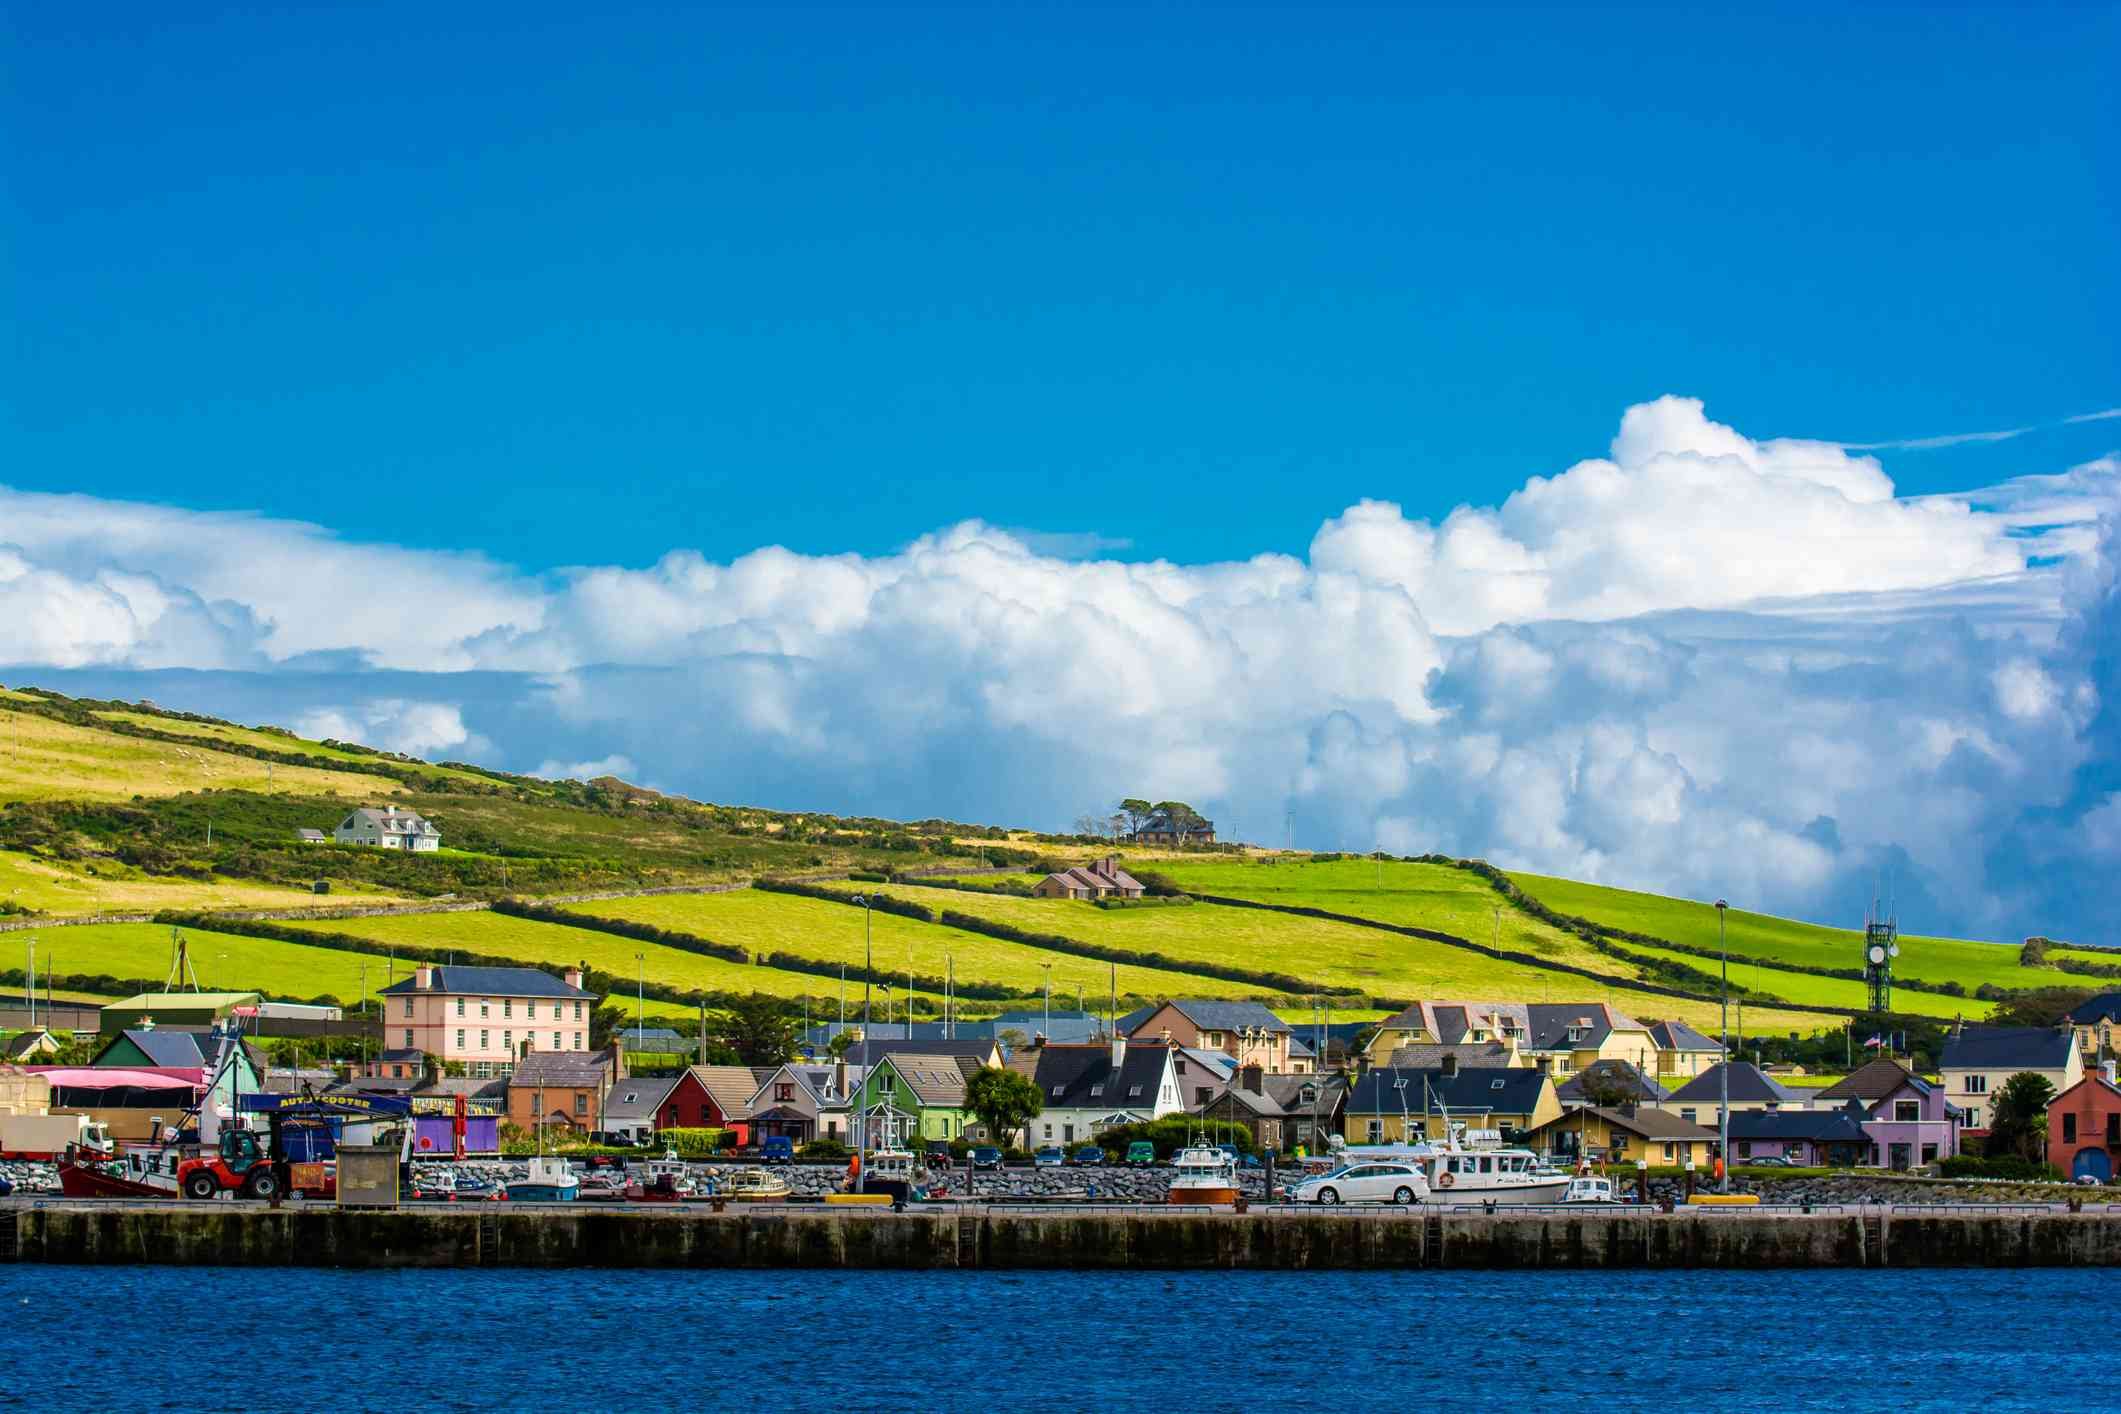 Harbor at the Coast of Dingle in Ireland